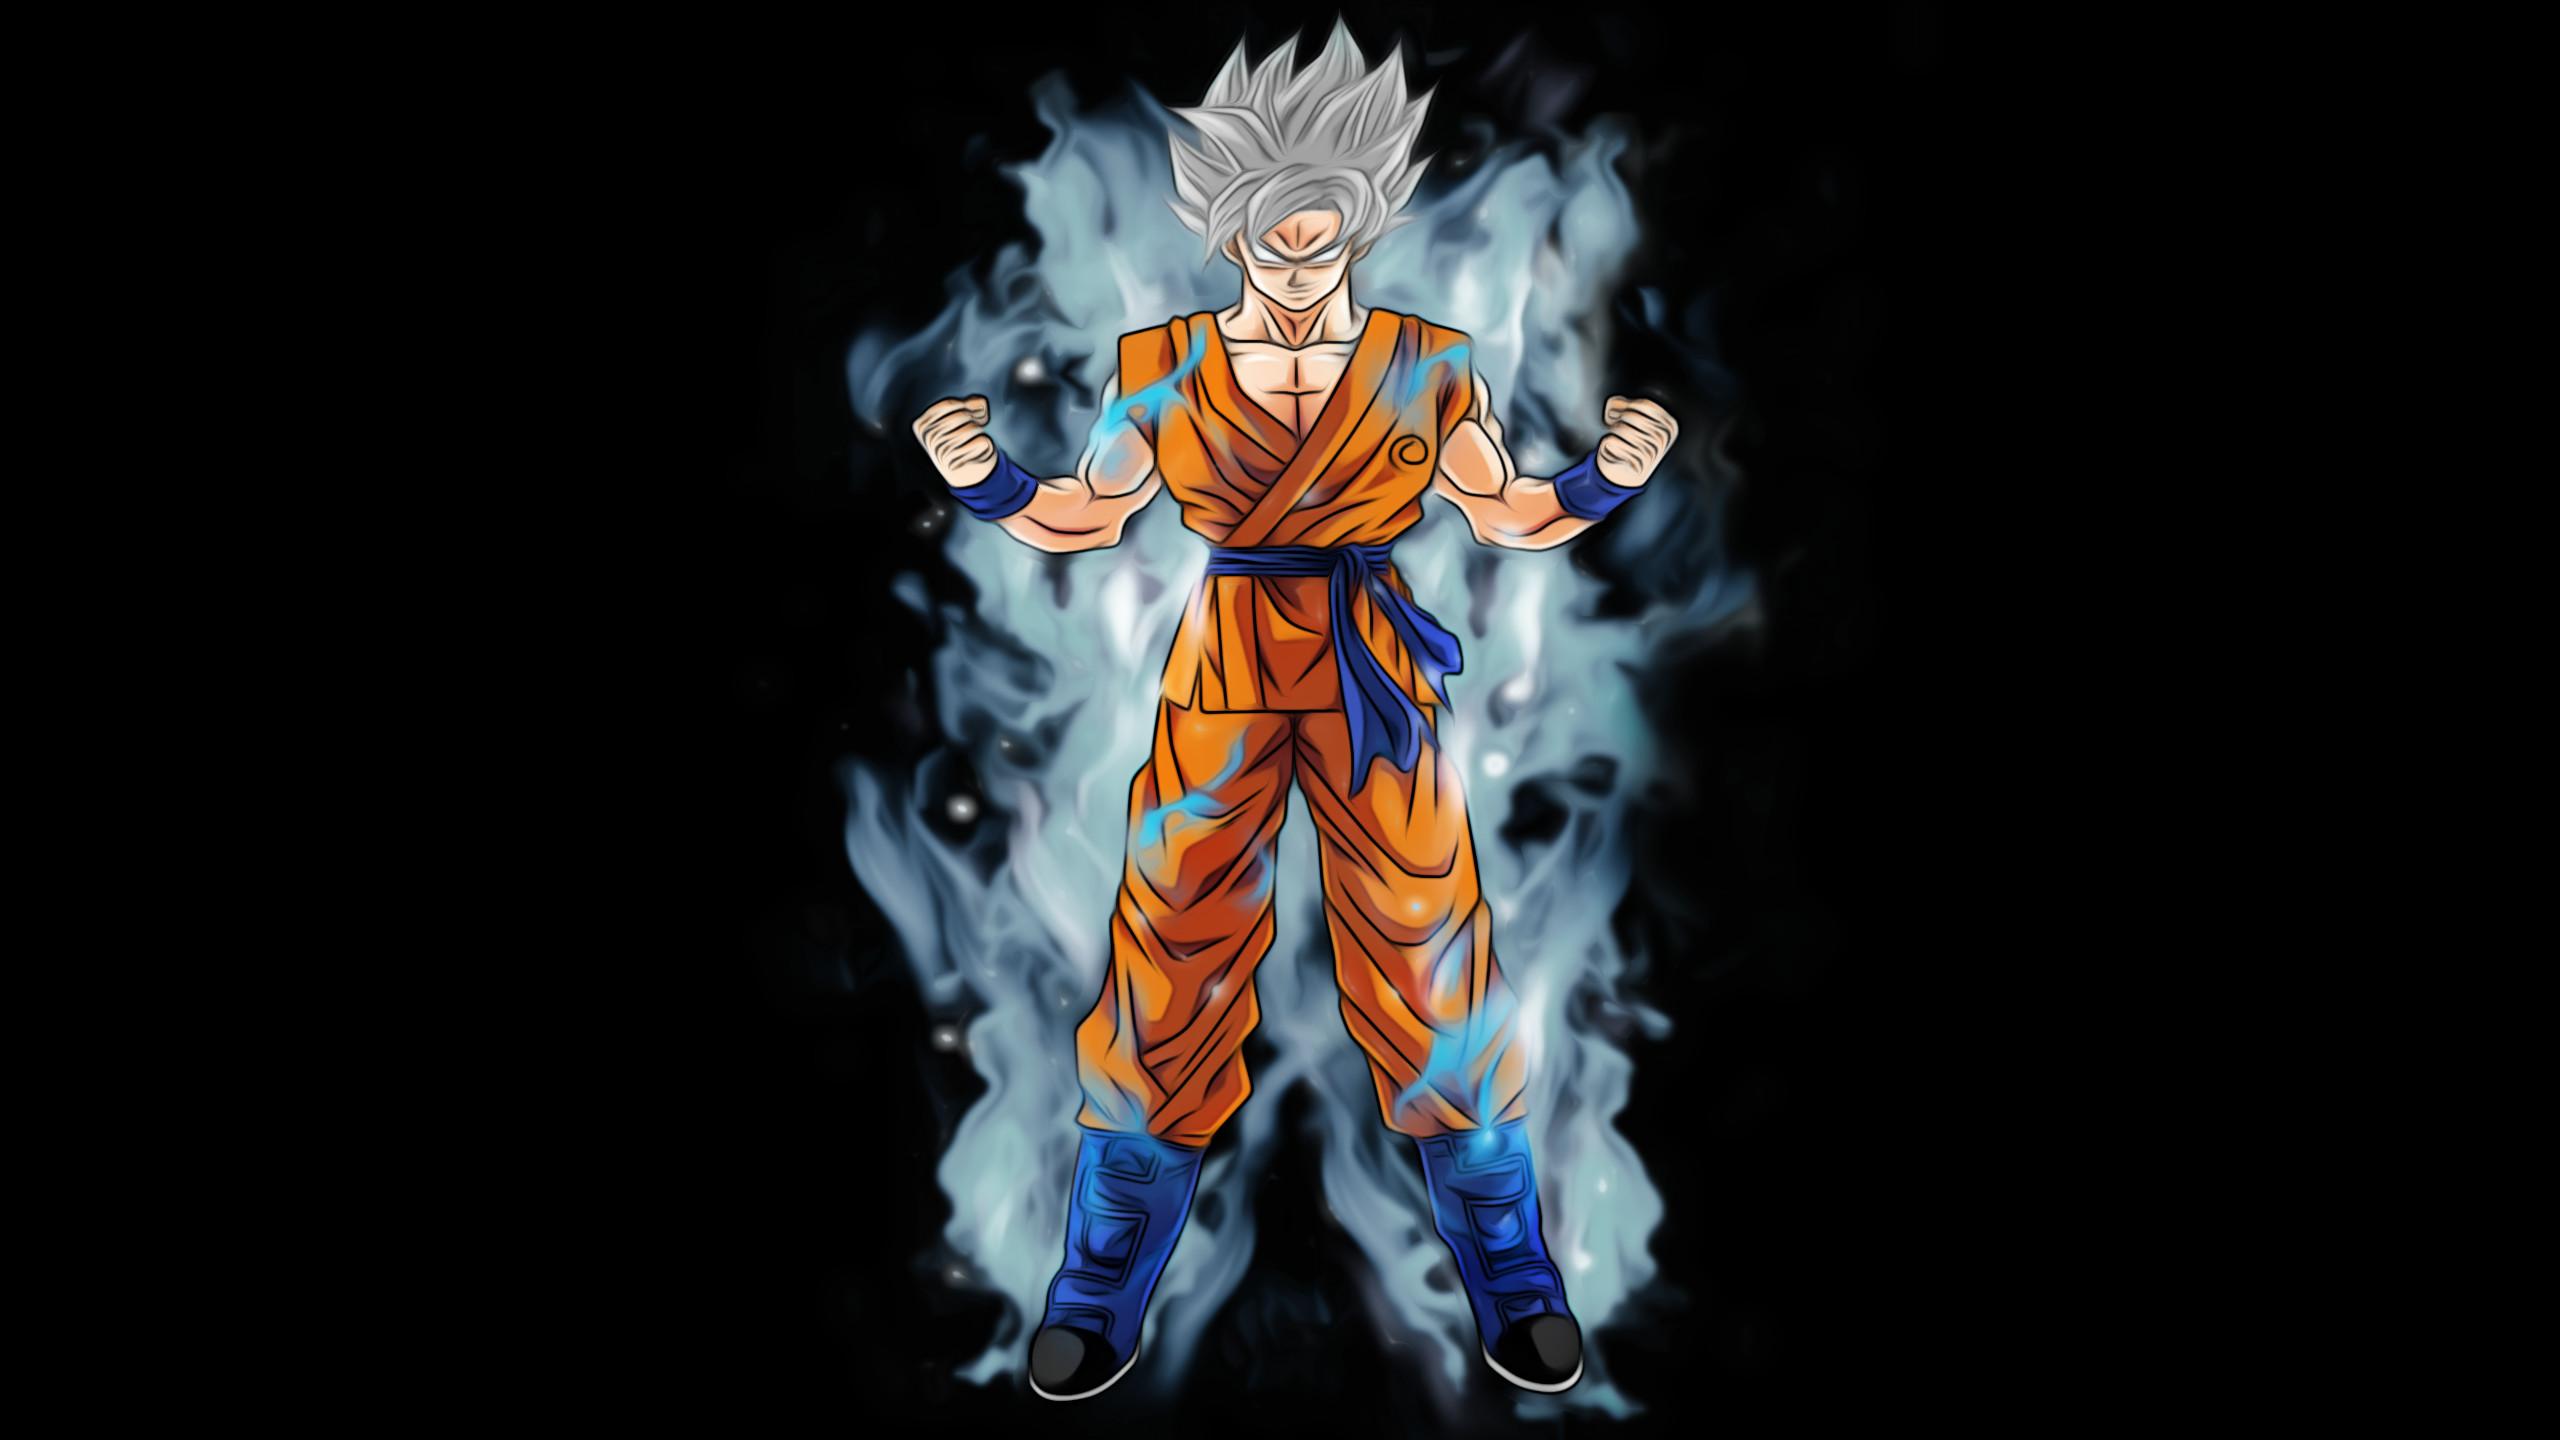 Goku super saiyan wallpaper 72 images - Dragon ball super wallpaper ...